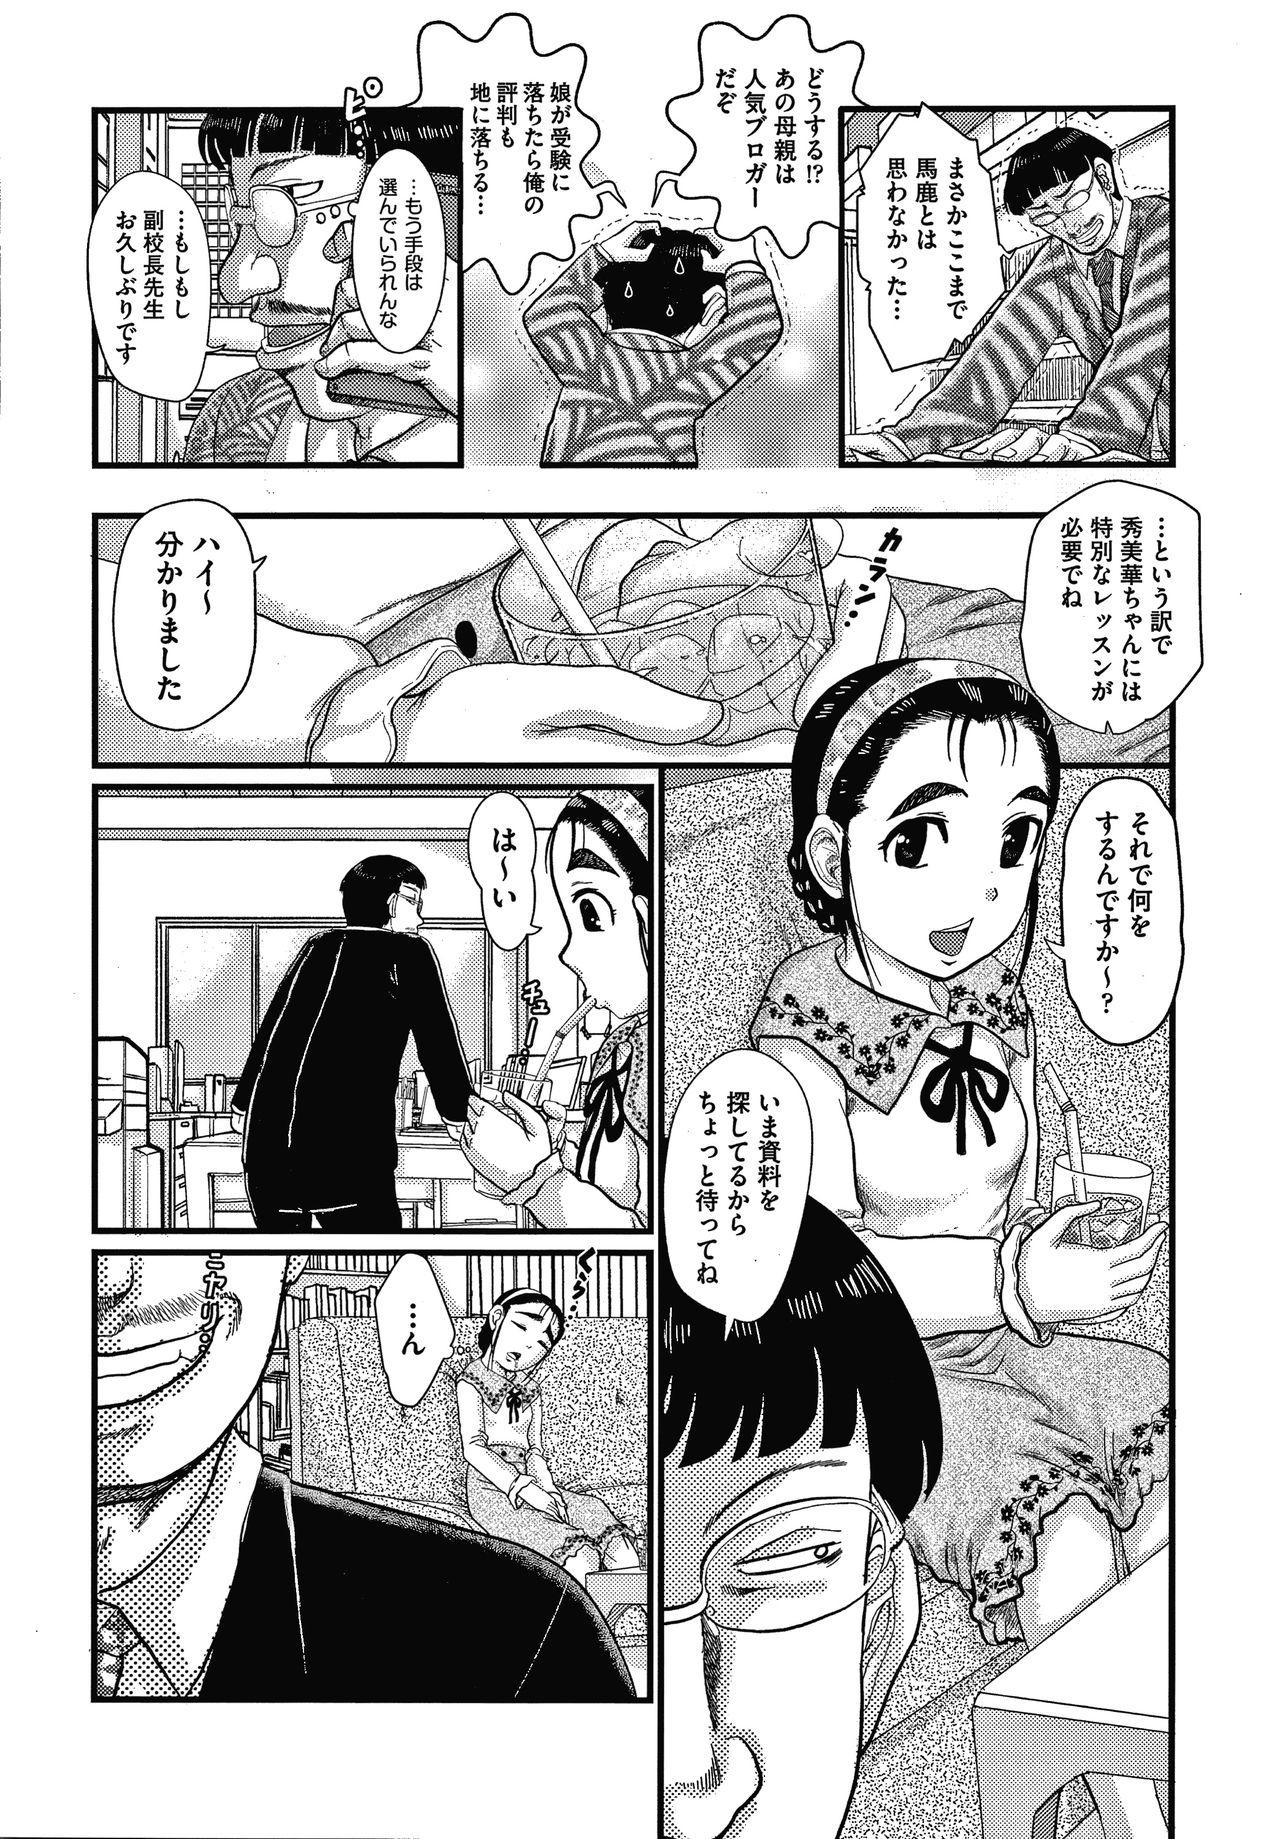 Shoujo Kumikyoku 15 148